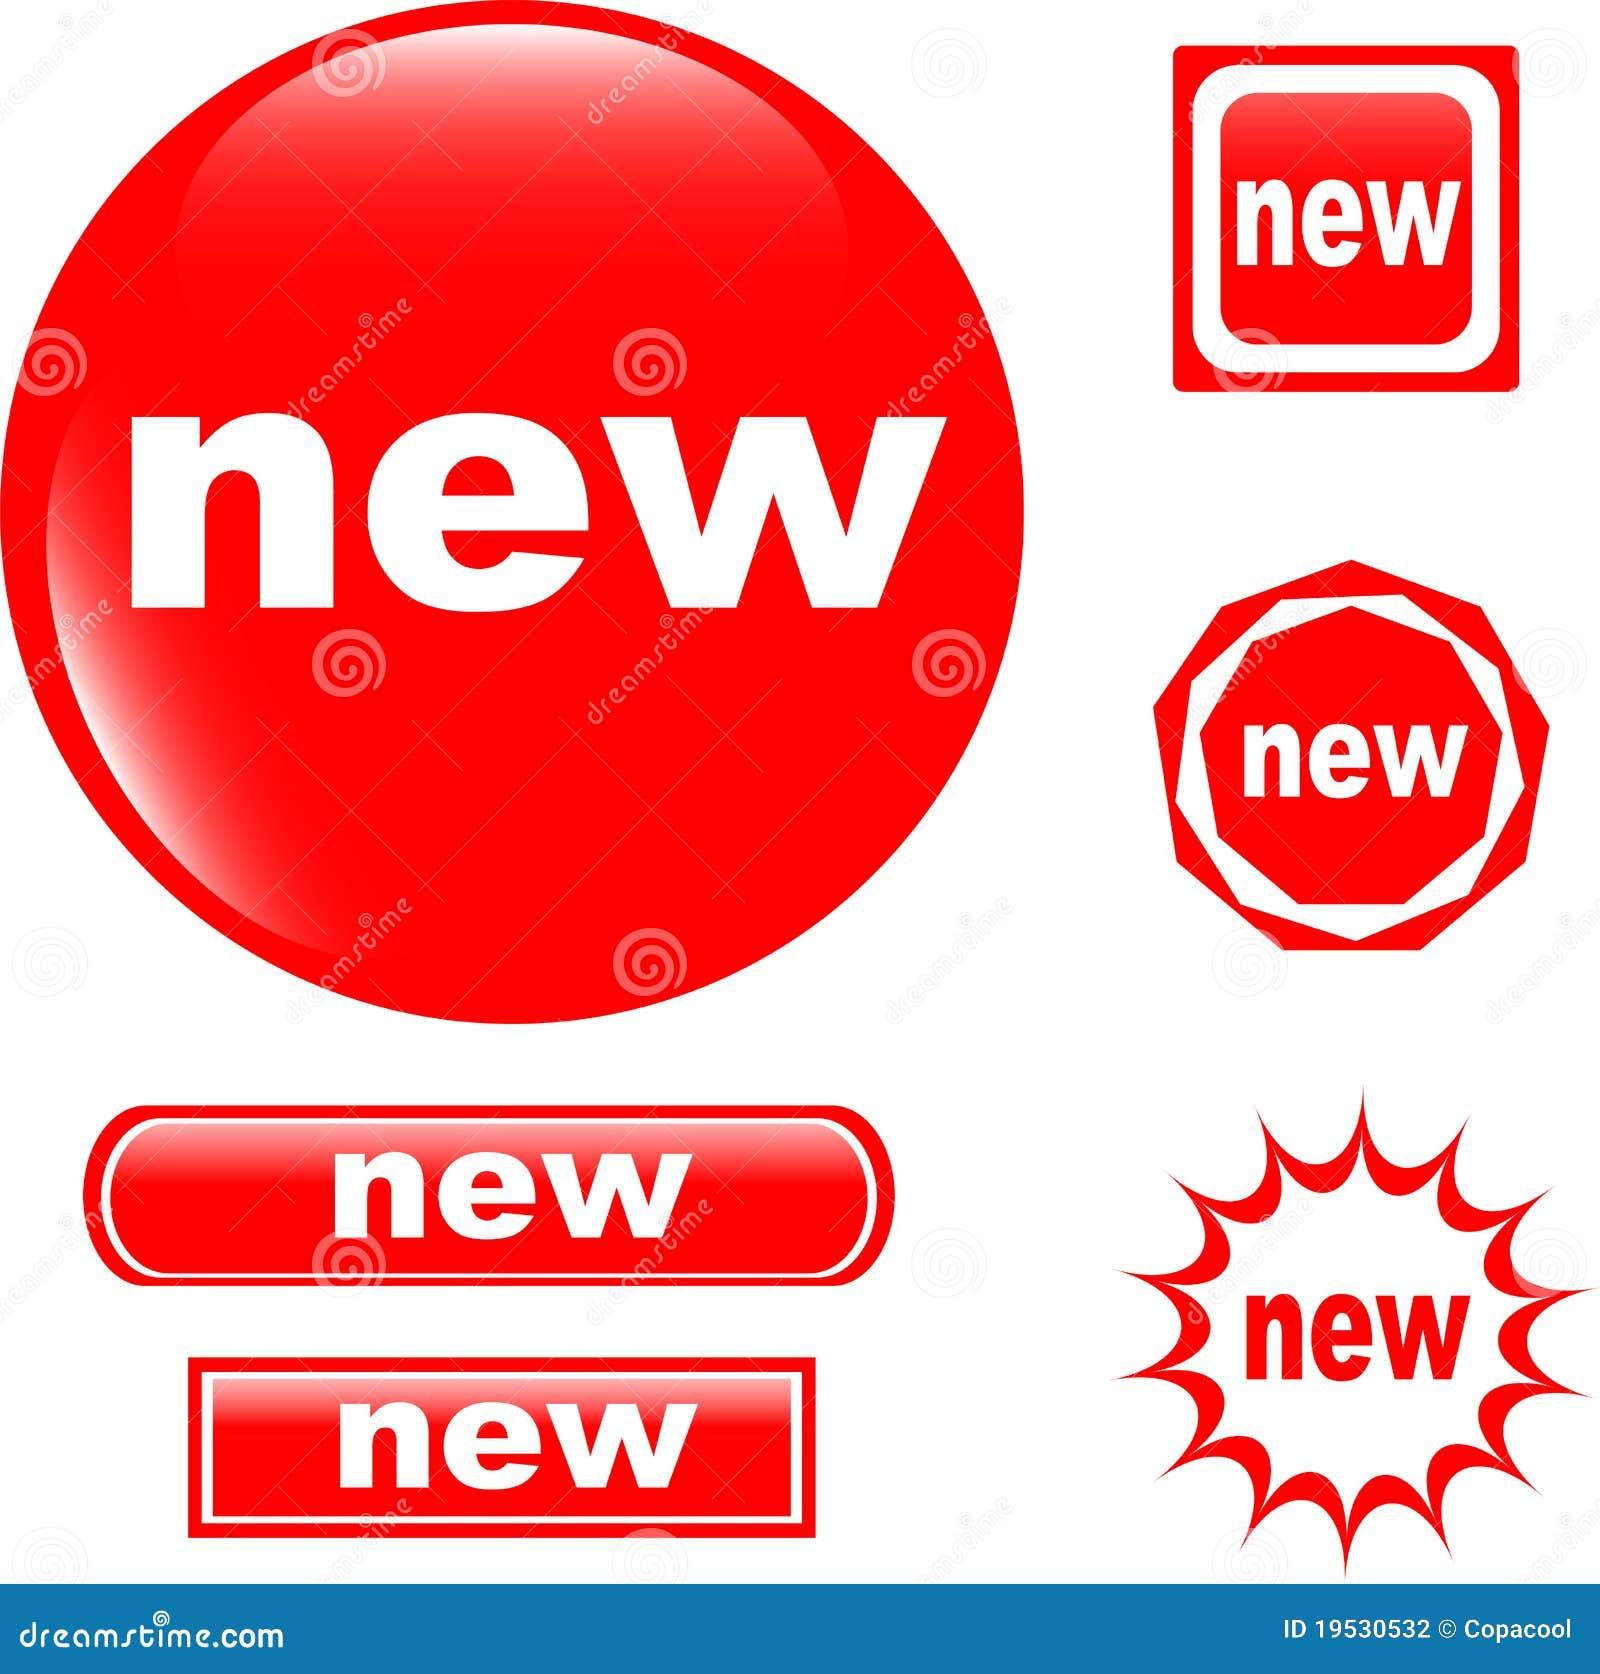 new button web glossy icon 19530532